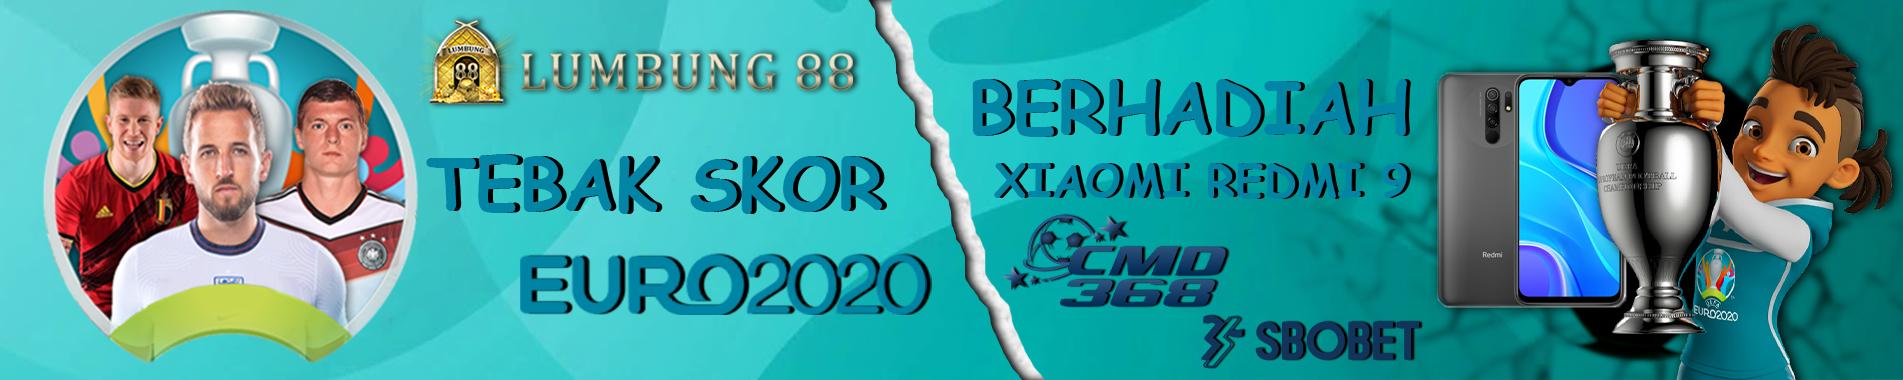 TEBAK SKOR EURO 2020